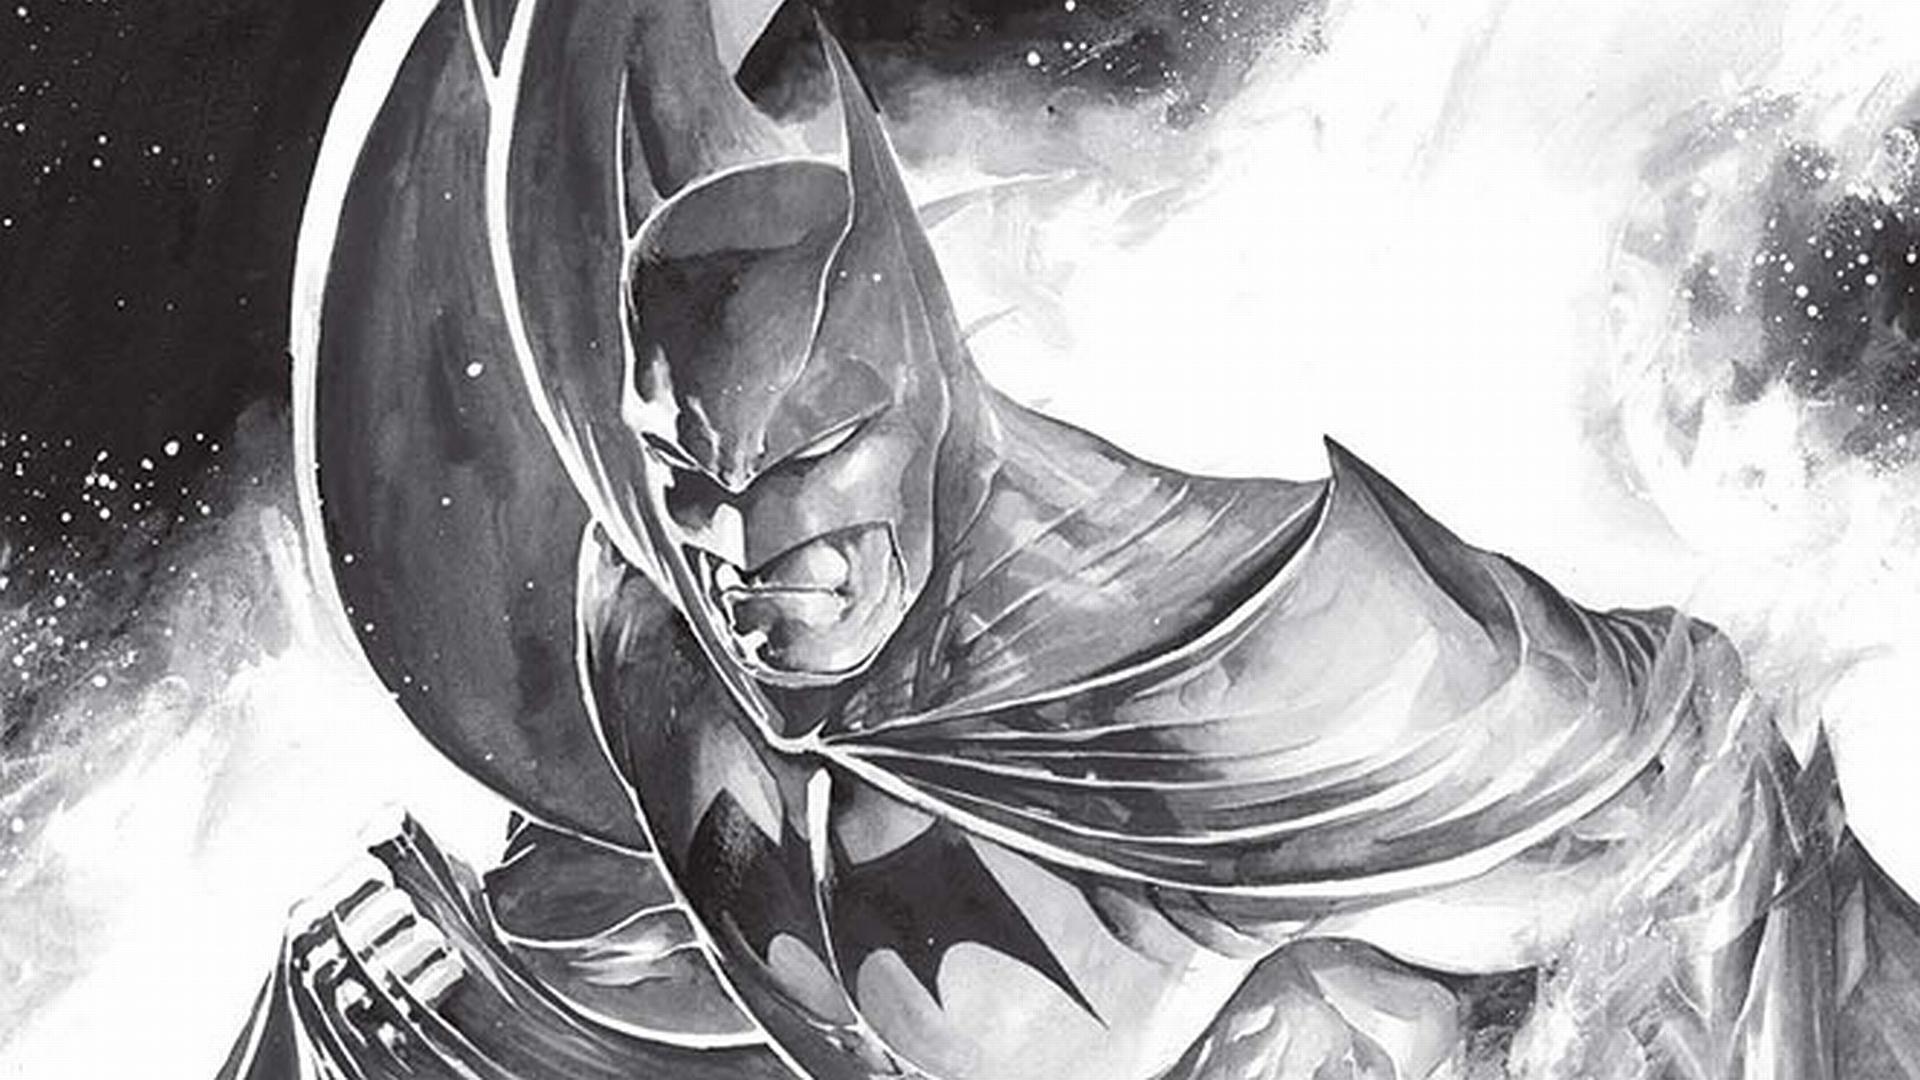 Batman full hd sfondo and sfondi 1920x1080 id 176549 for Sfondi batman